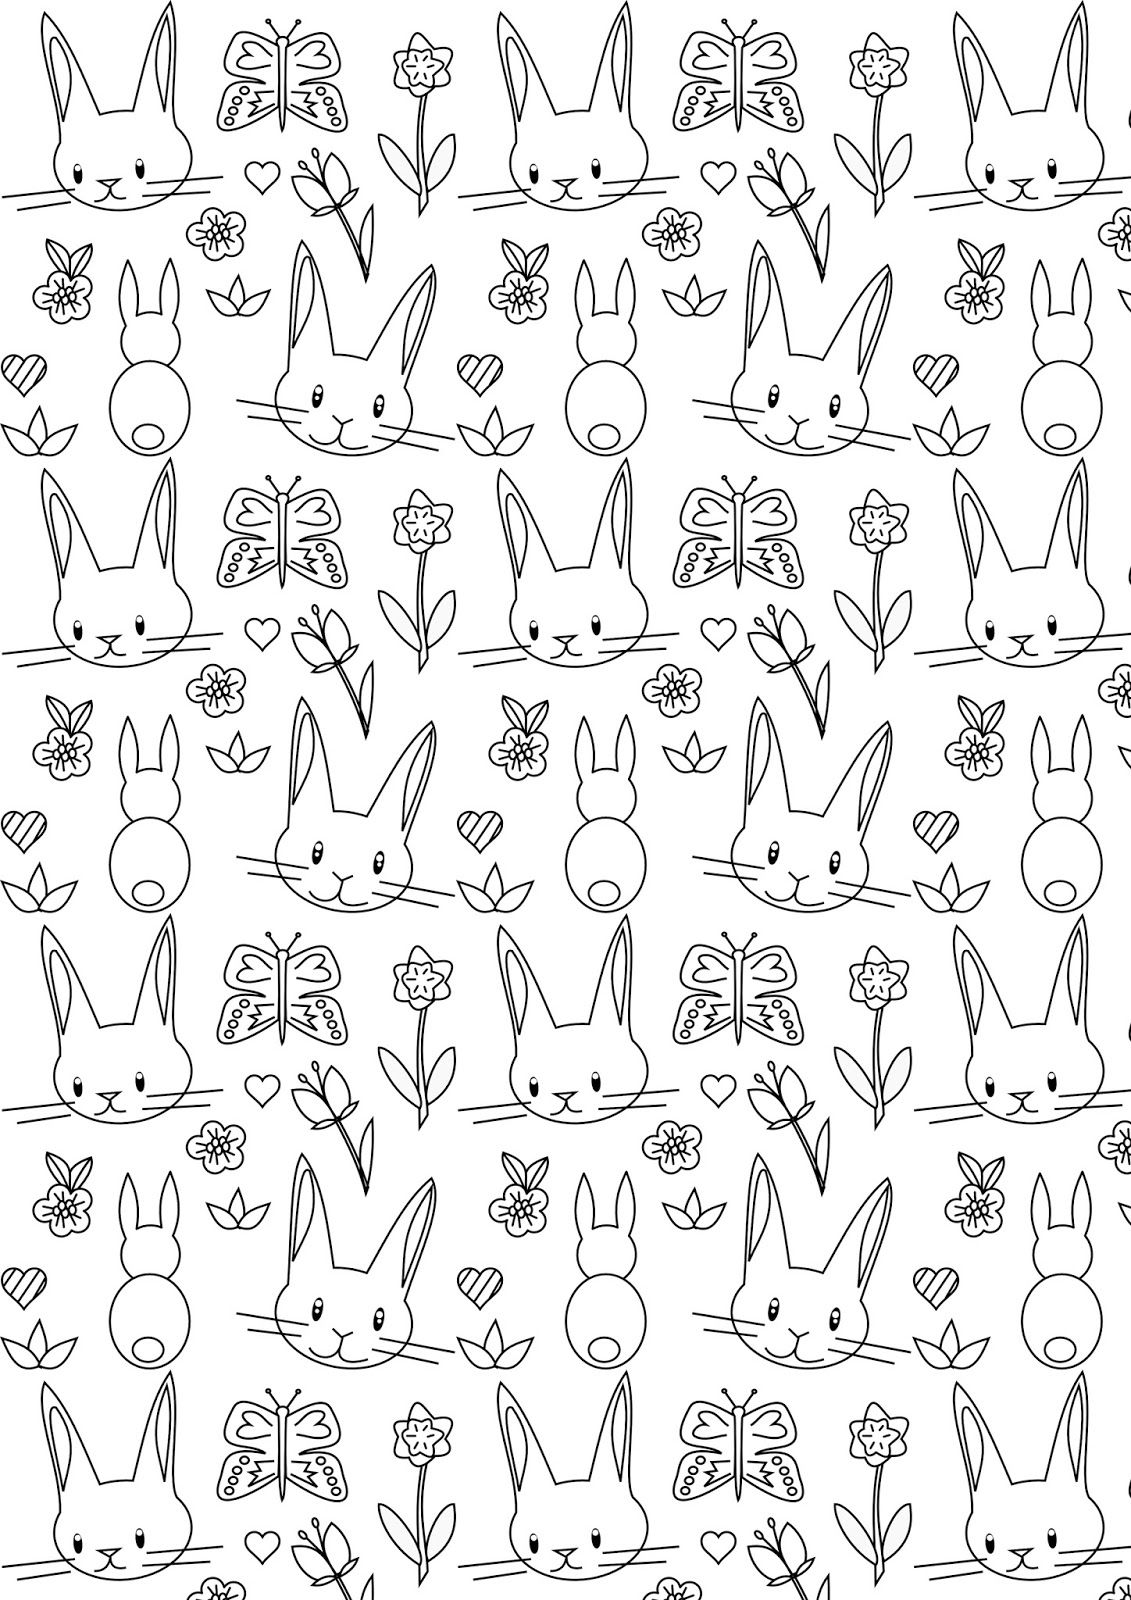 Free printable bunny coloring page - ausdruckbares Ausmalpapier ...